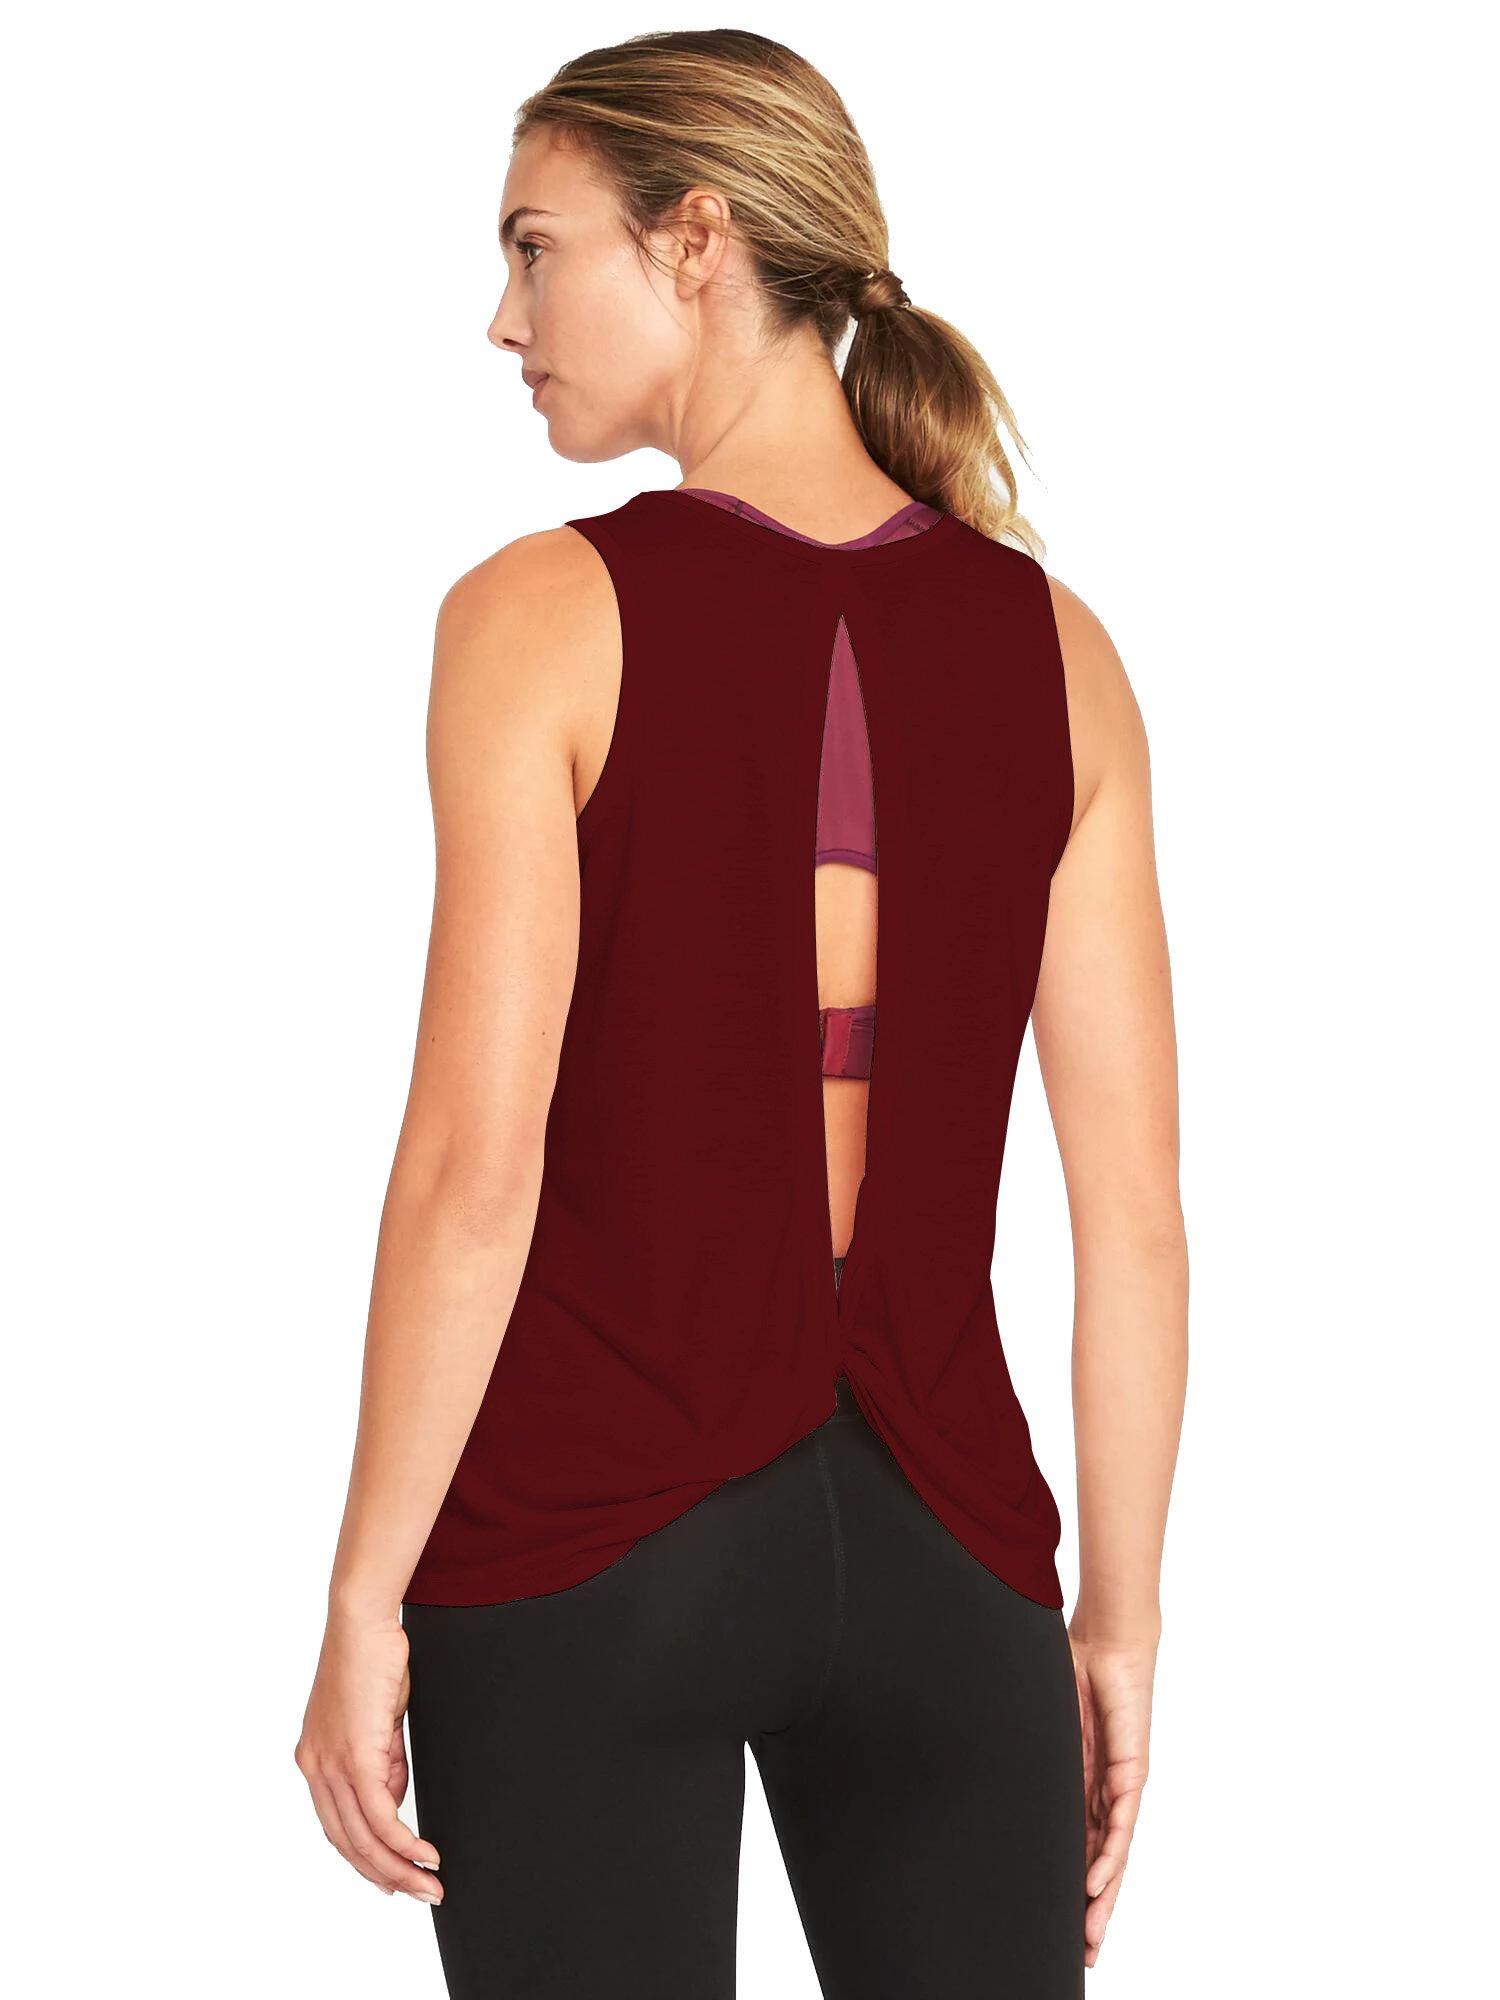 Bestisun Women's Sexy Yoga Tank Top Backless Open Back Workout Cute Style Sport Shirt Casual Knit Tee Wine Red L